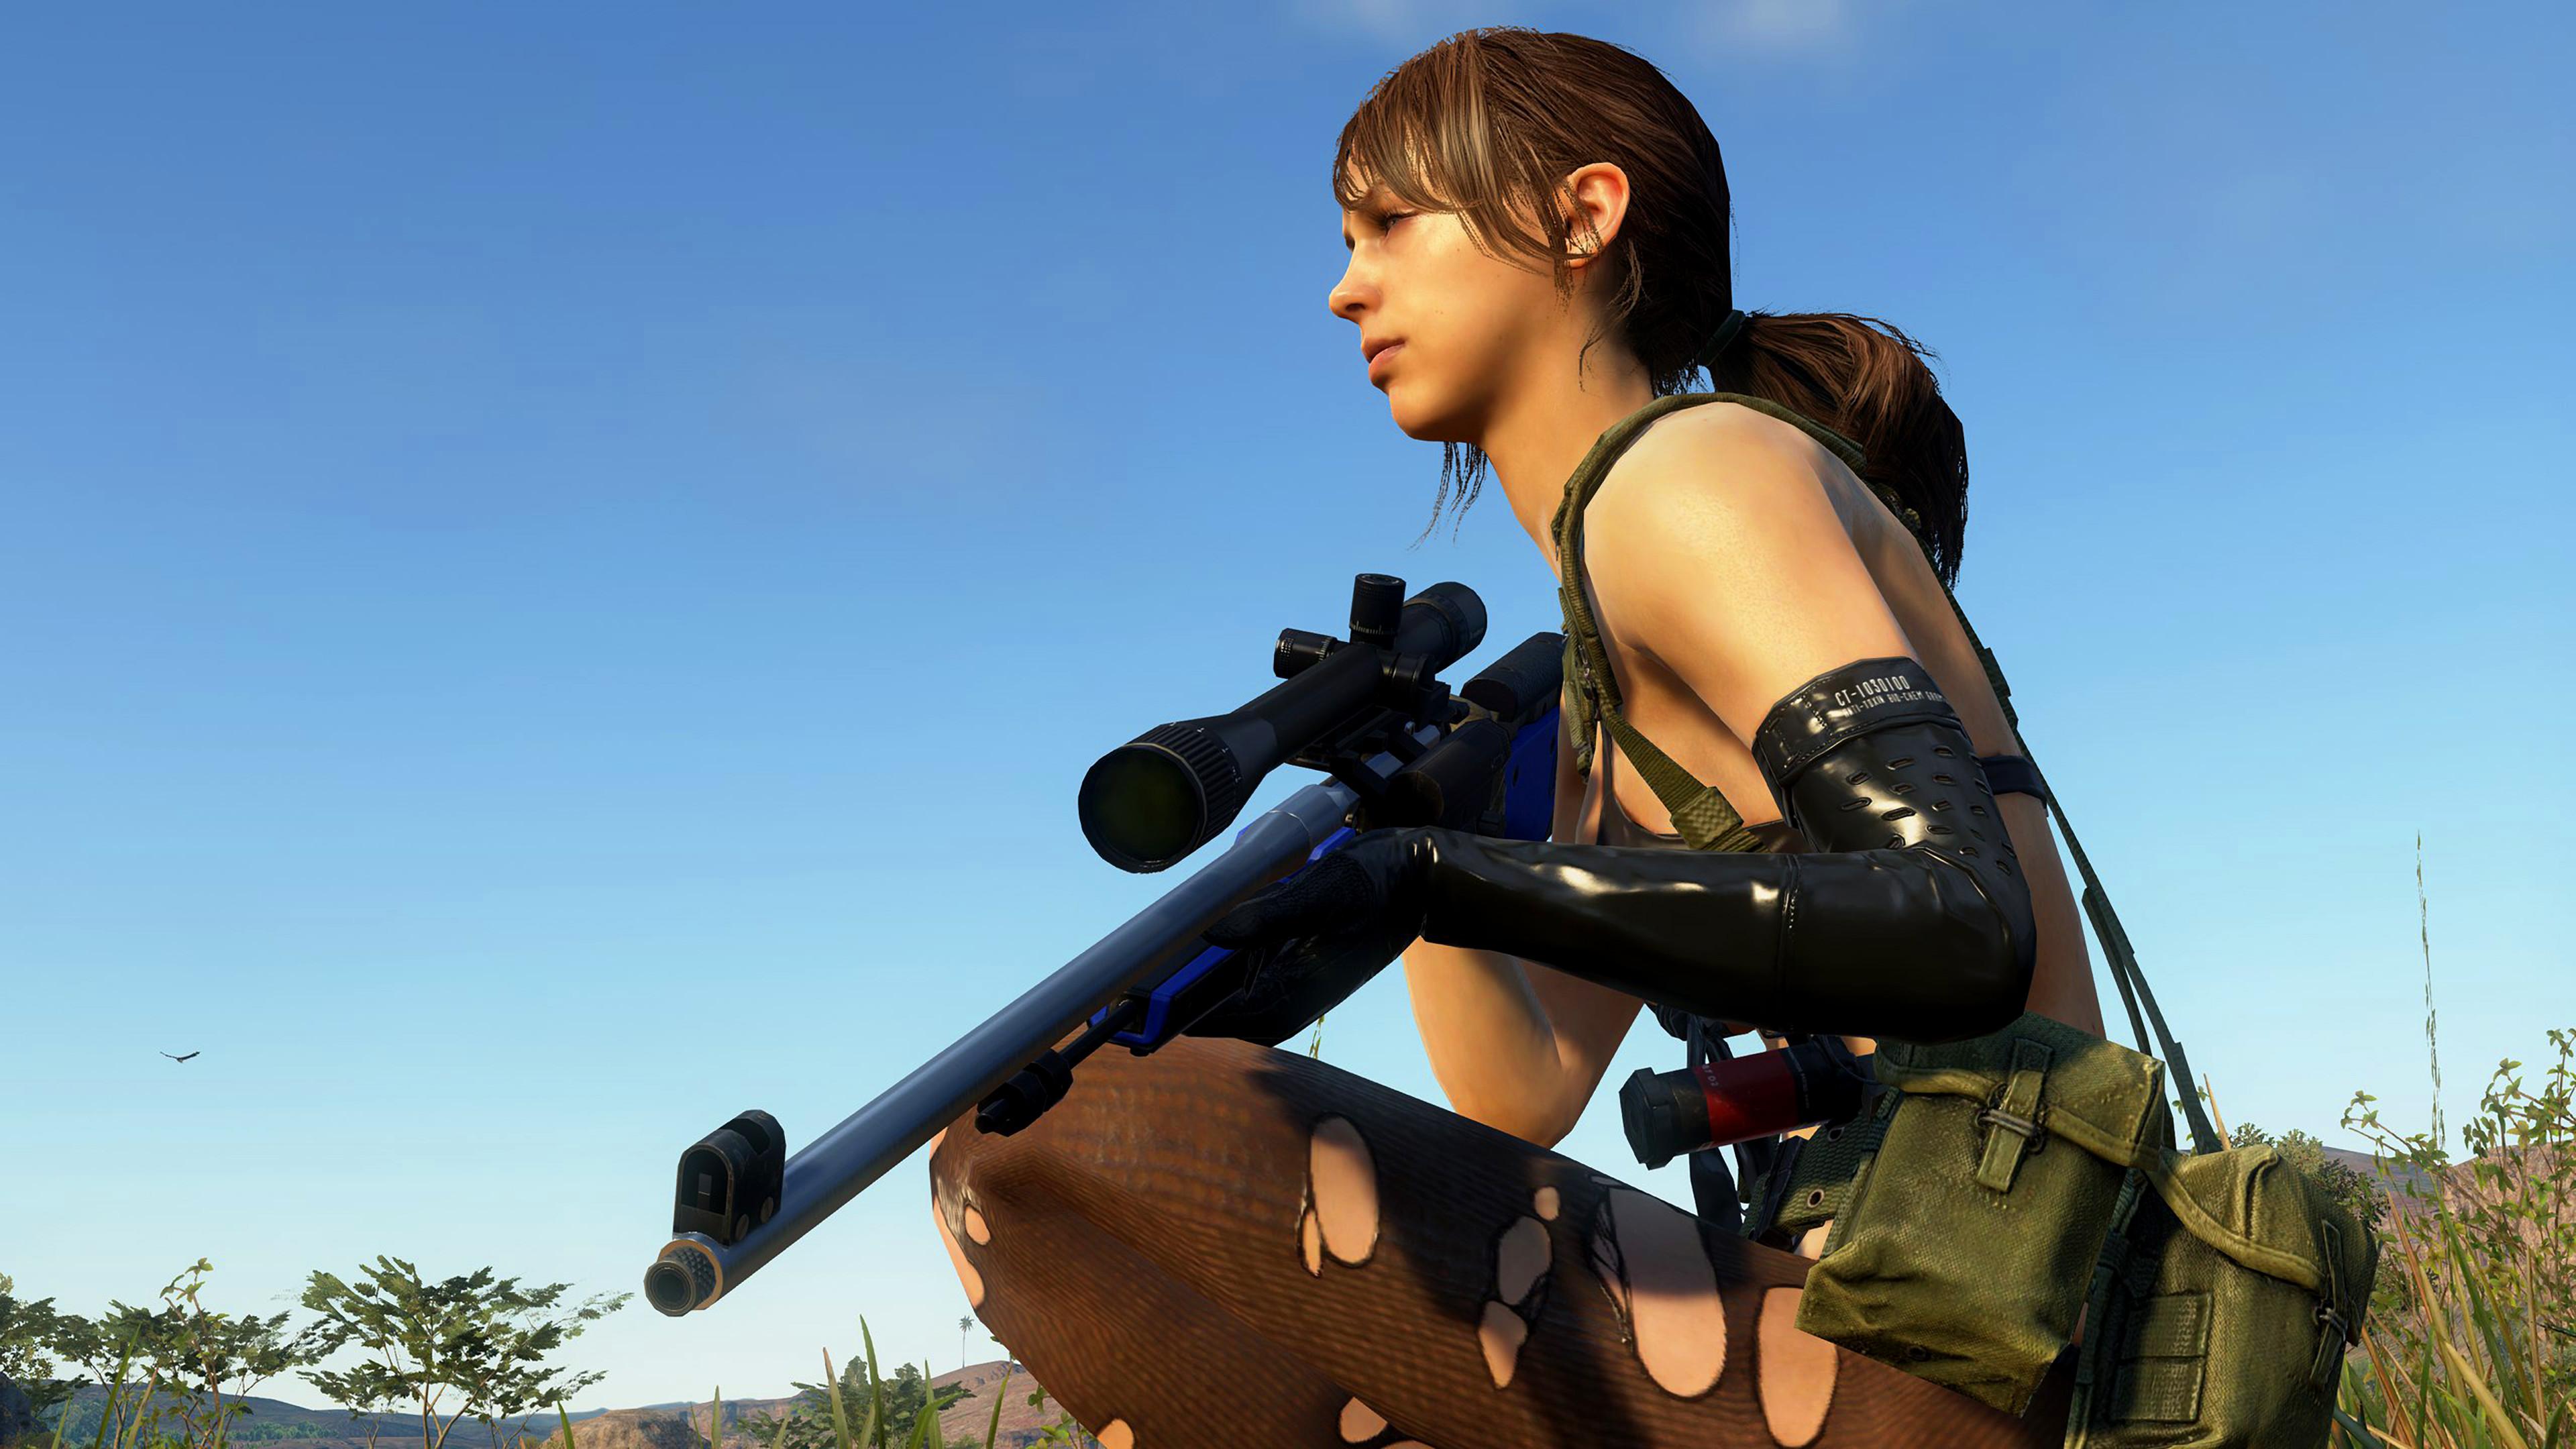 Res: 3840x2160, General  Metal Gear Solid V: The Phantom Pain Quiet screen shot